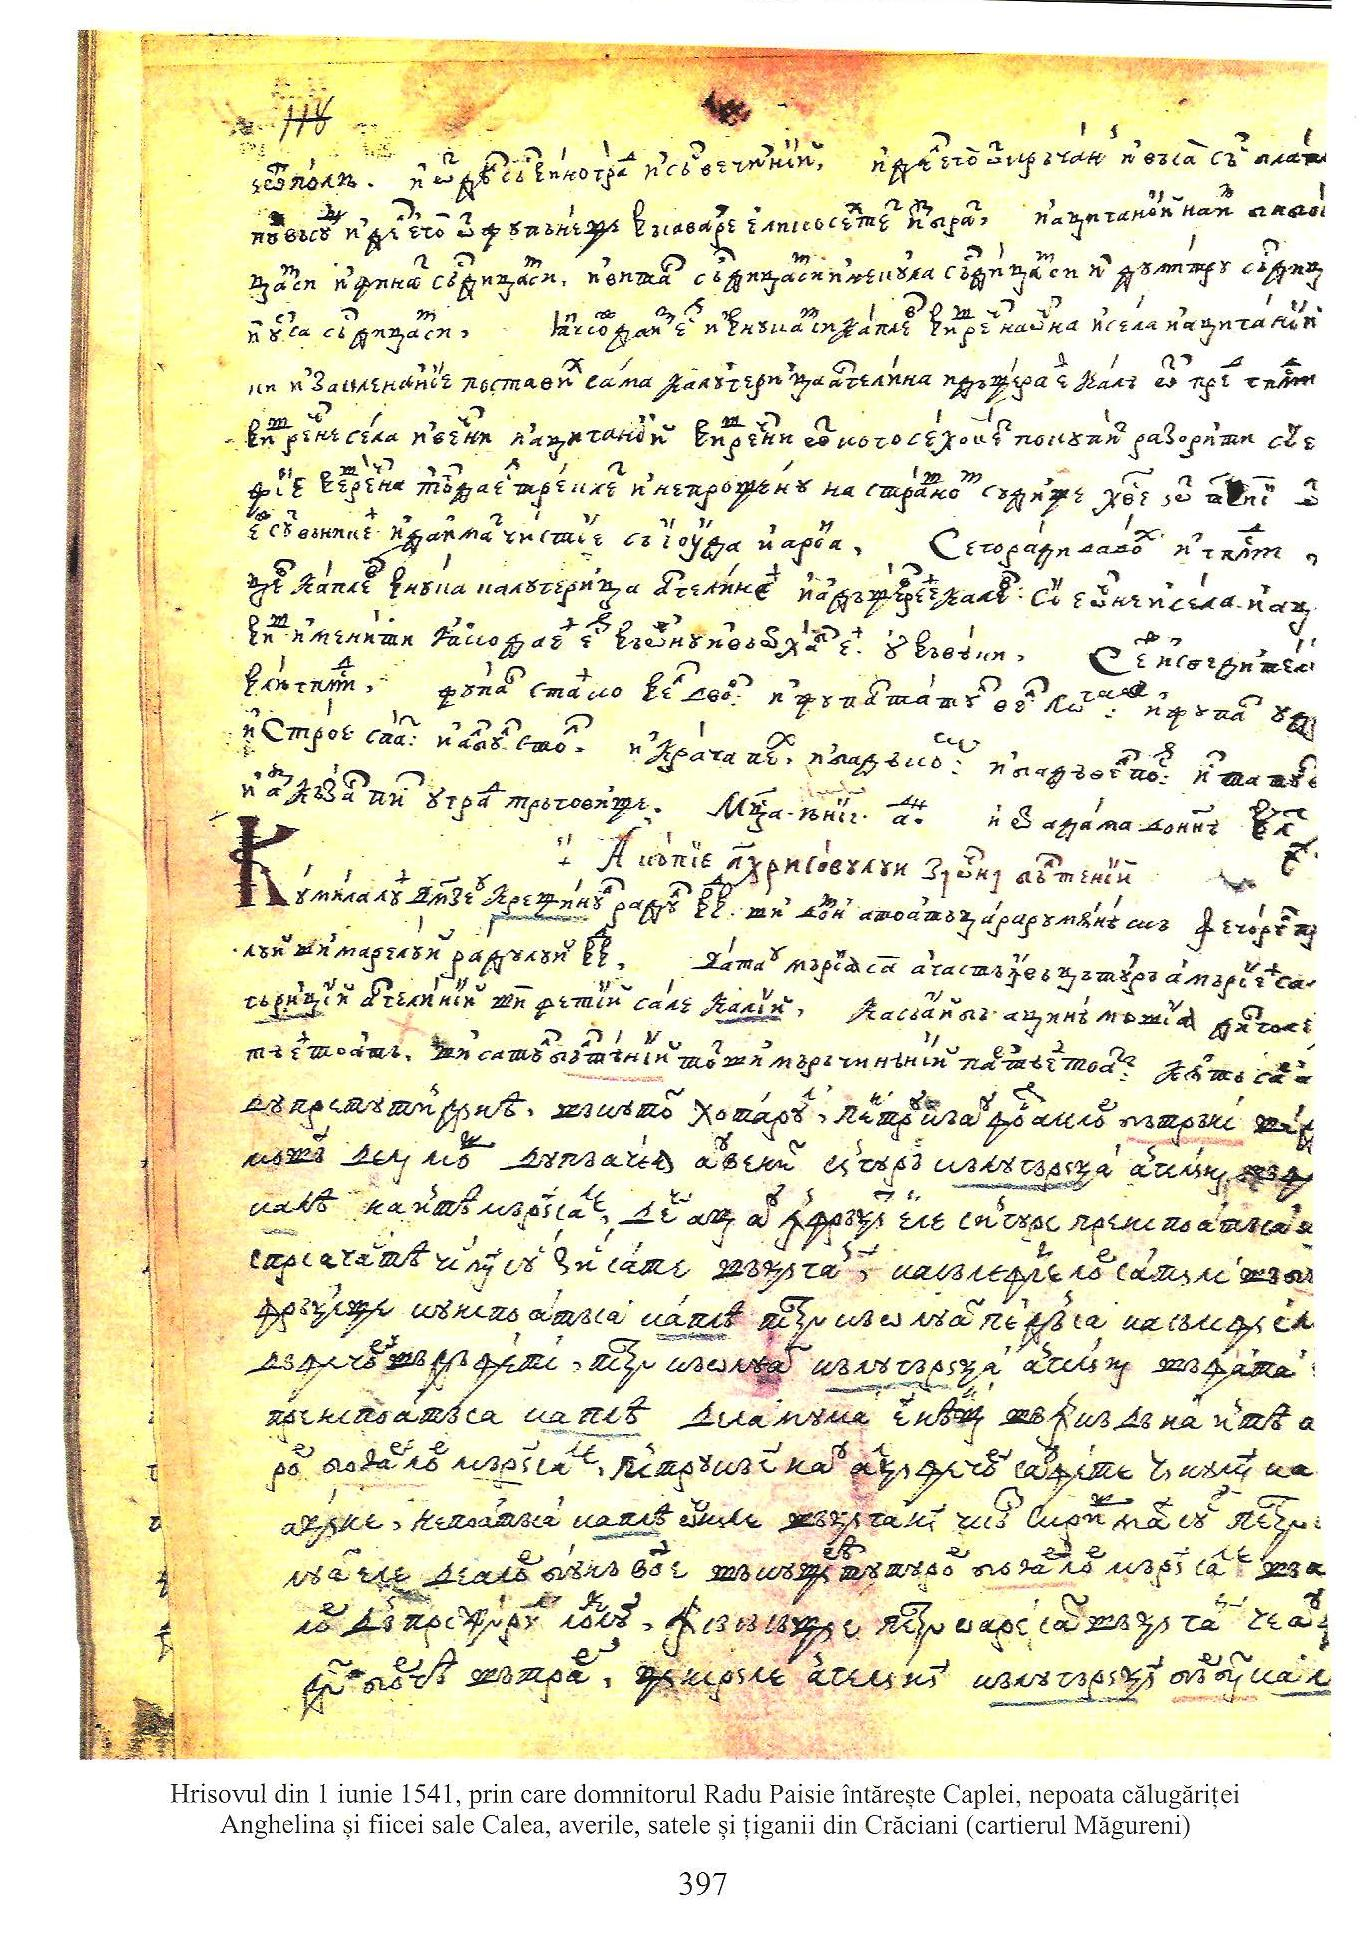 Hrisov Radu Paisie 1541